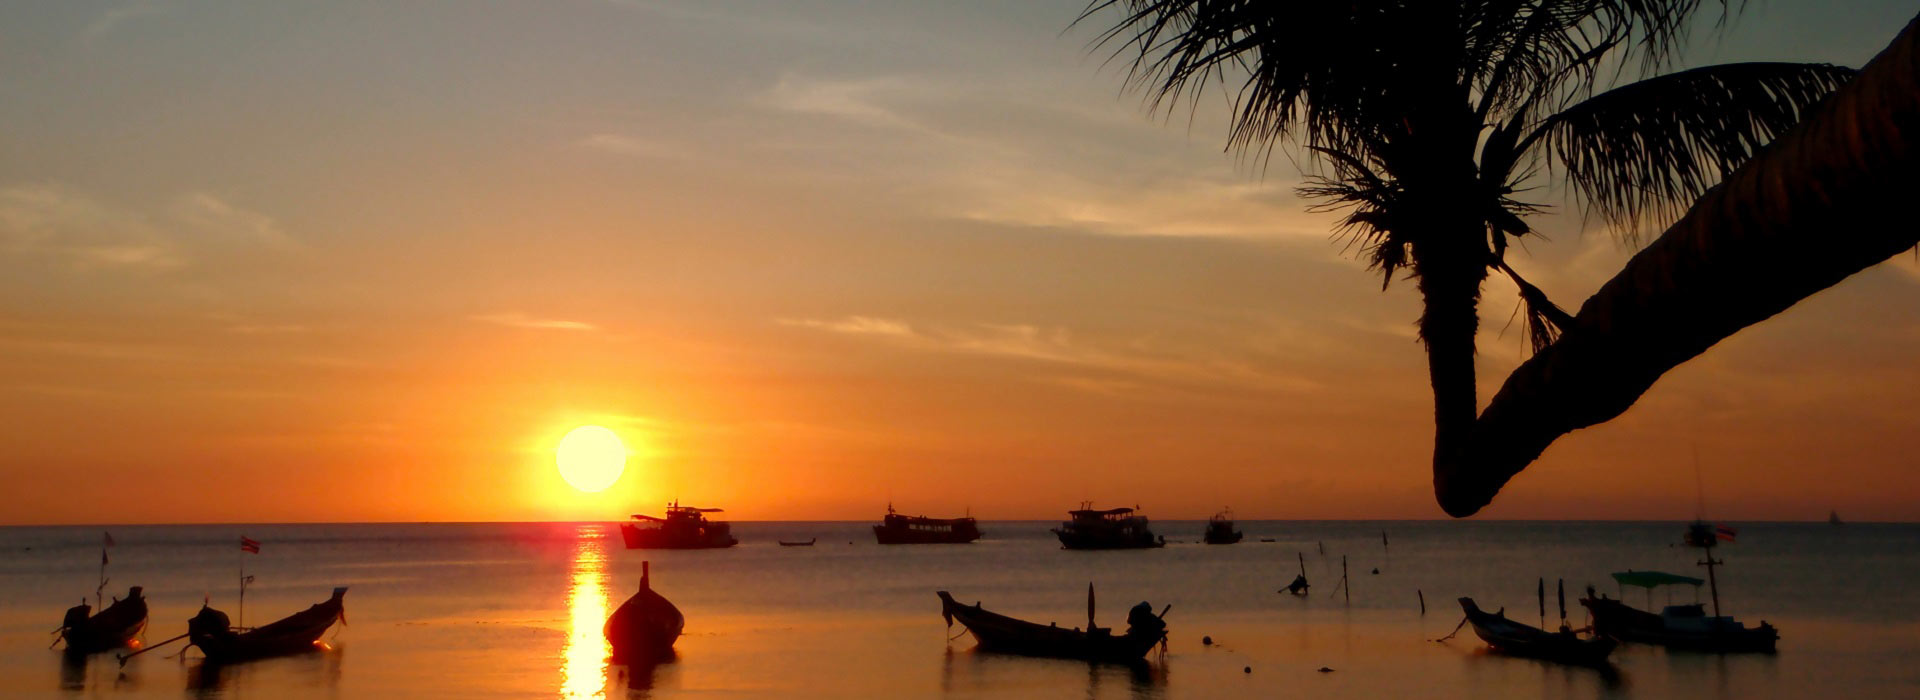 kai_bay_beach_ko_chang_island